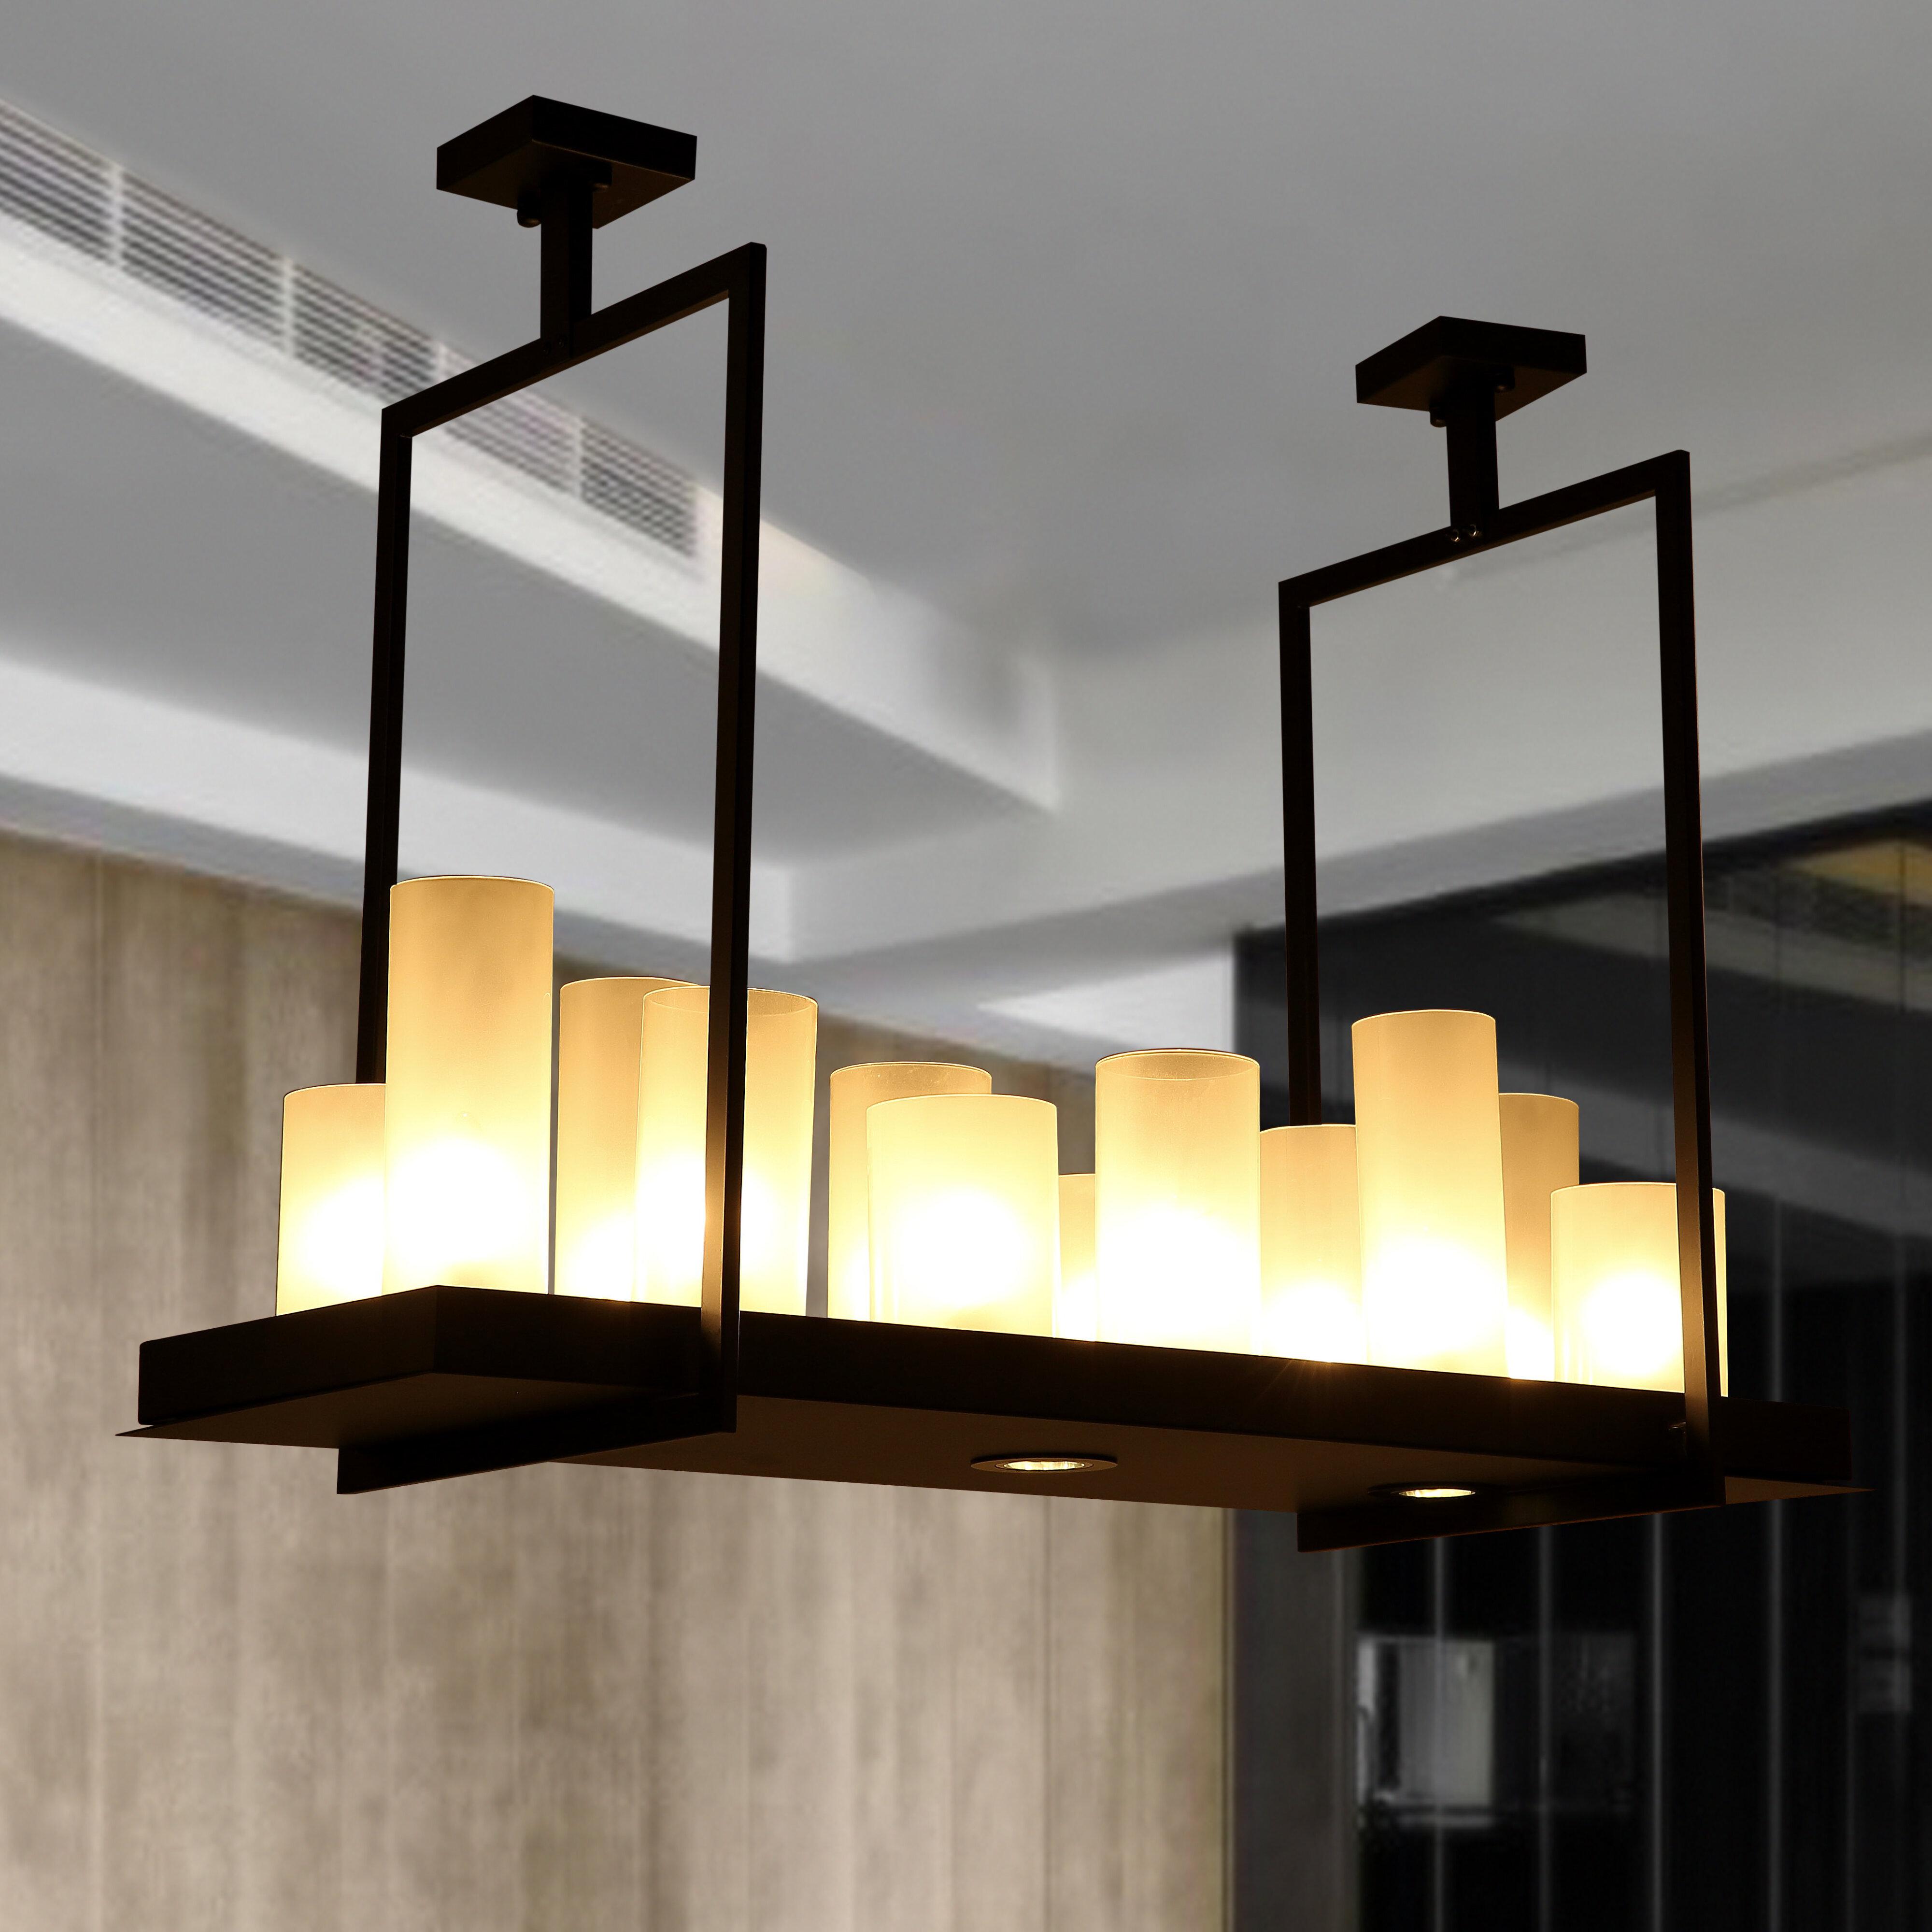 Wrought studio donati candle 12 light kitchen island pendant wayfair